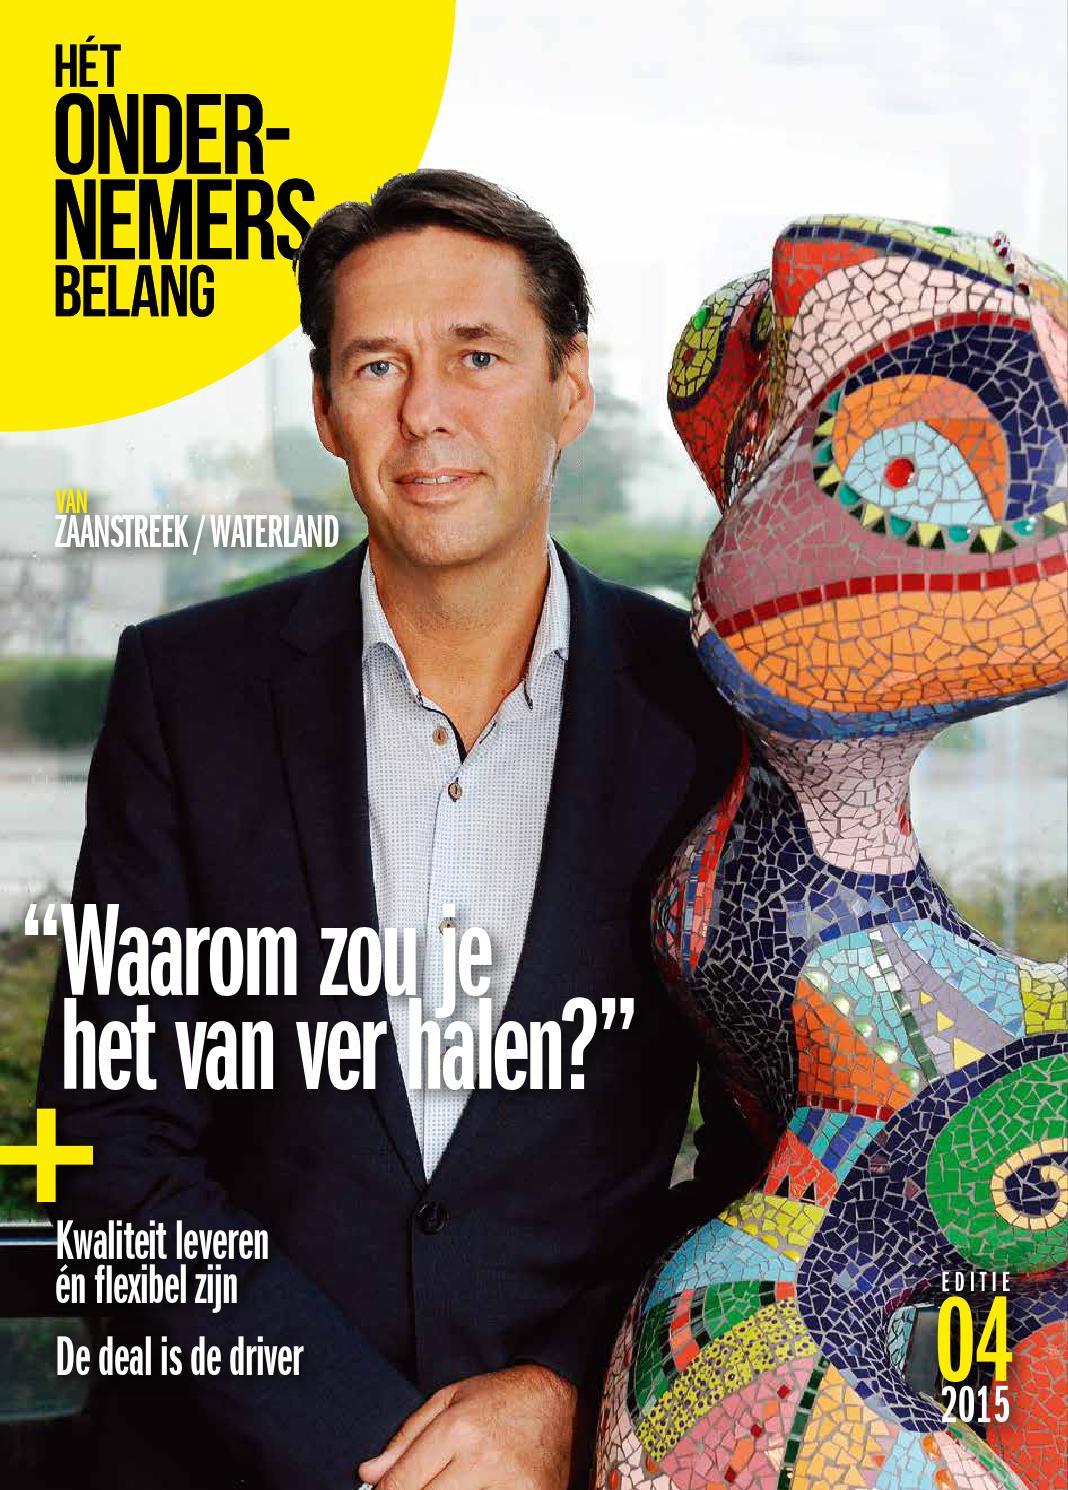 Het ondernemersbelang zaanstreek / waterland 4 2015 by uitgeverij ...